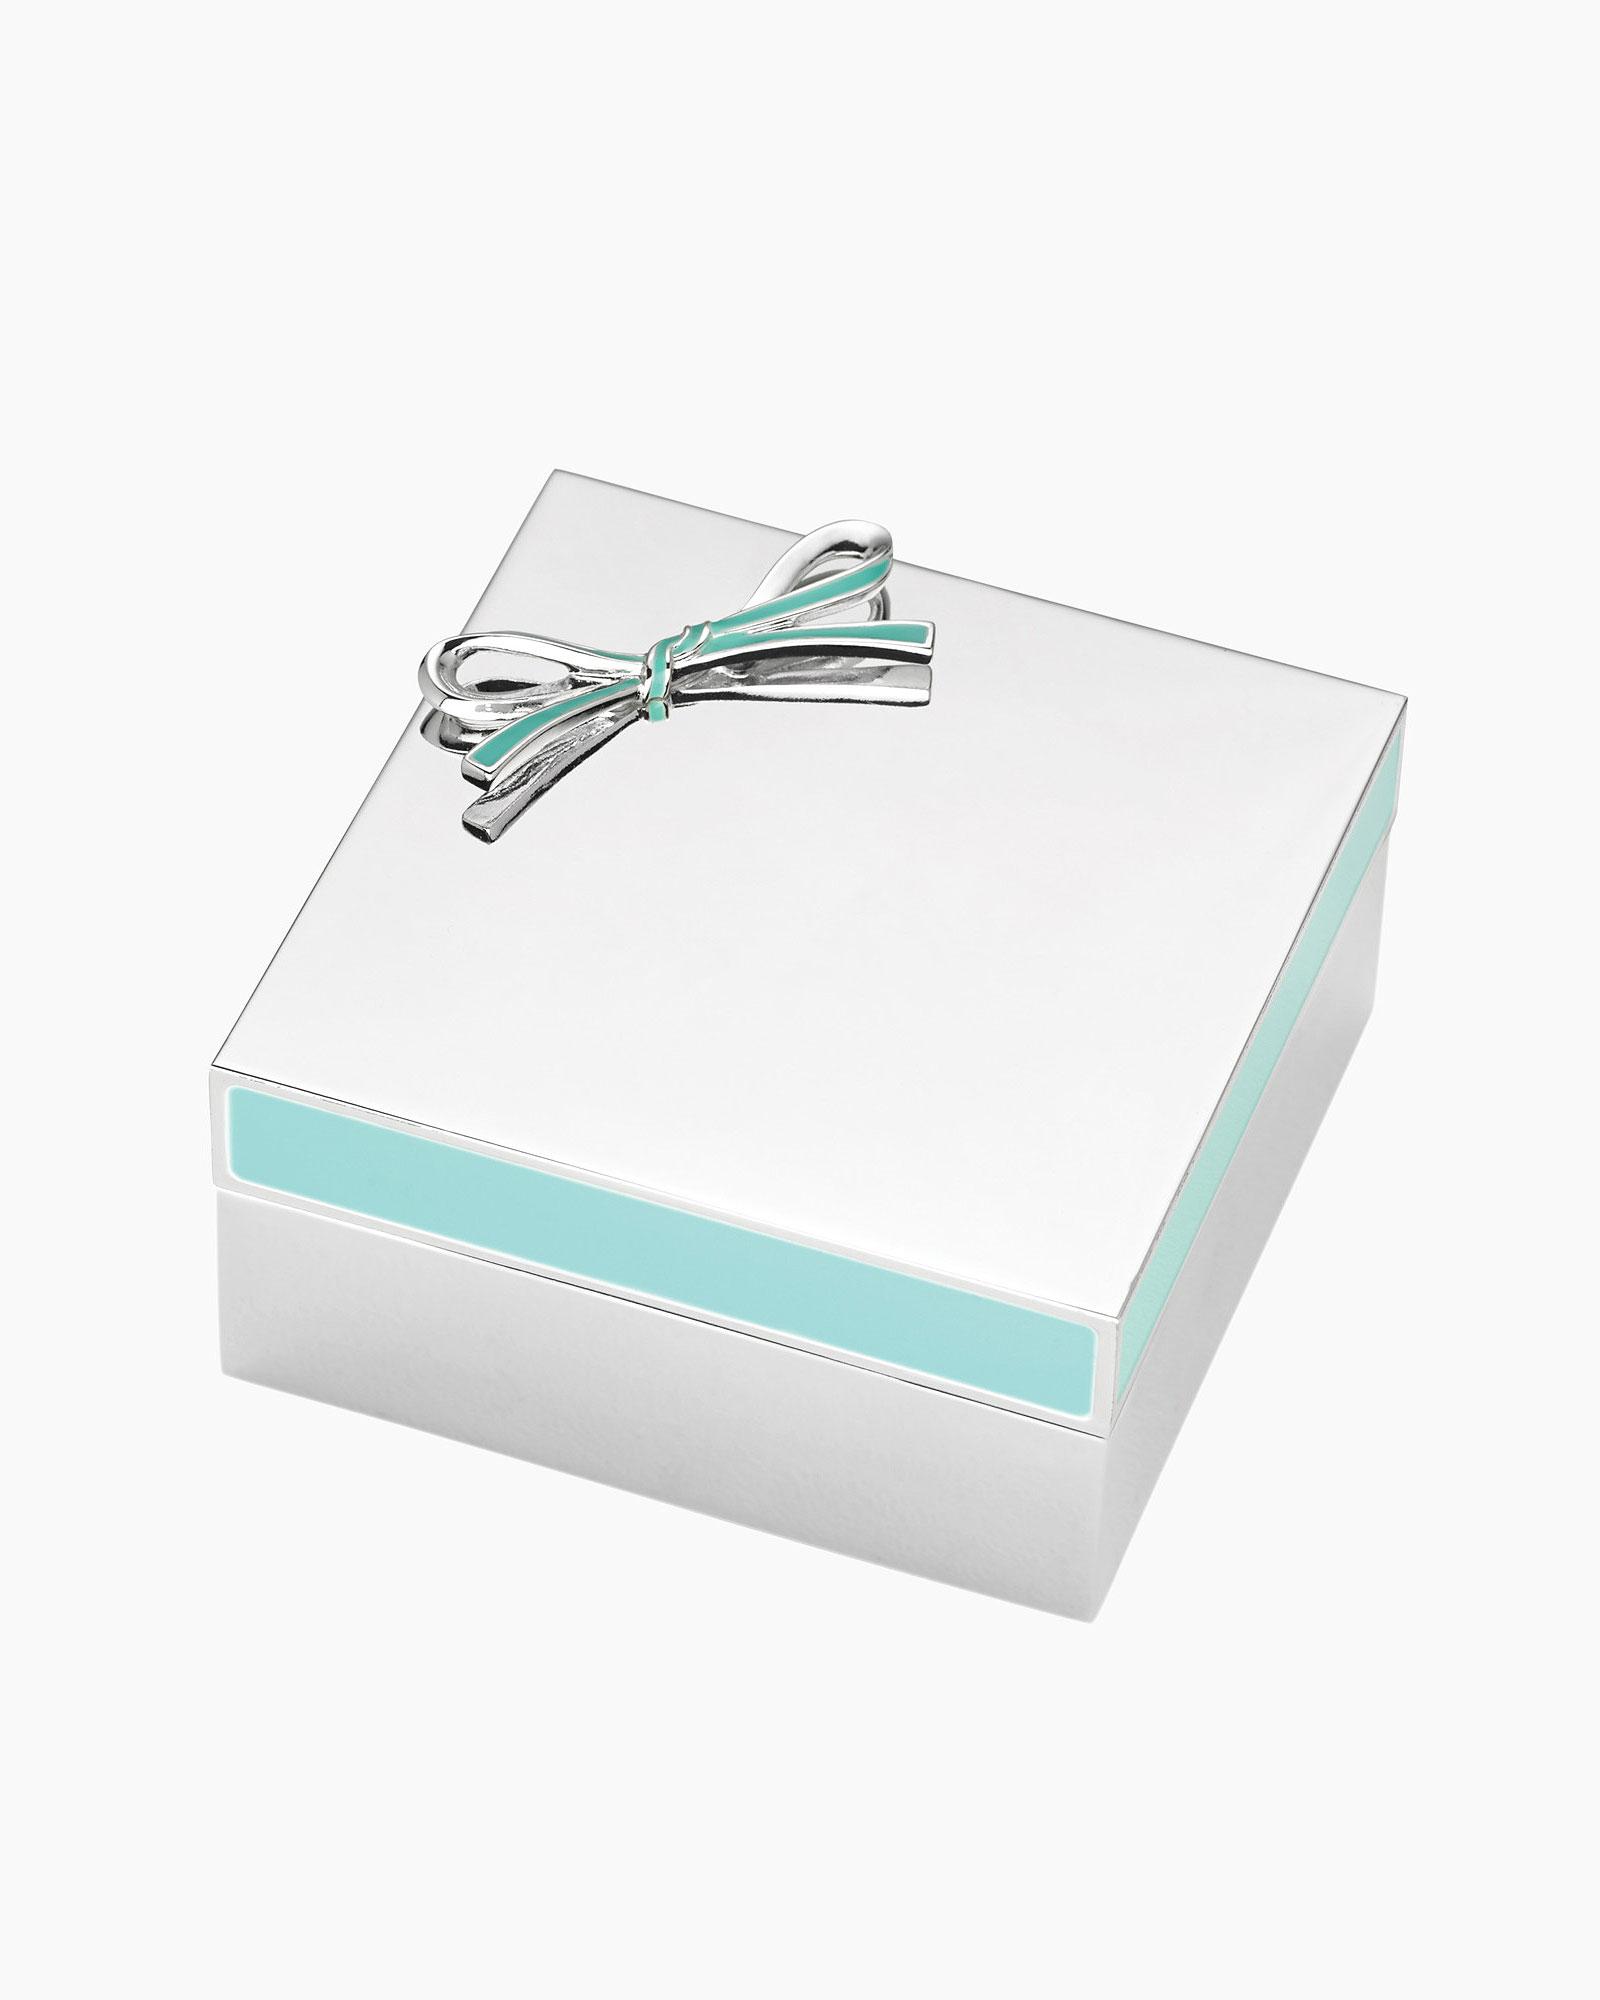 unique-ring-box-vienna-lane-0316.jpg